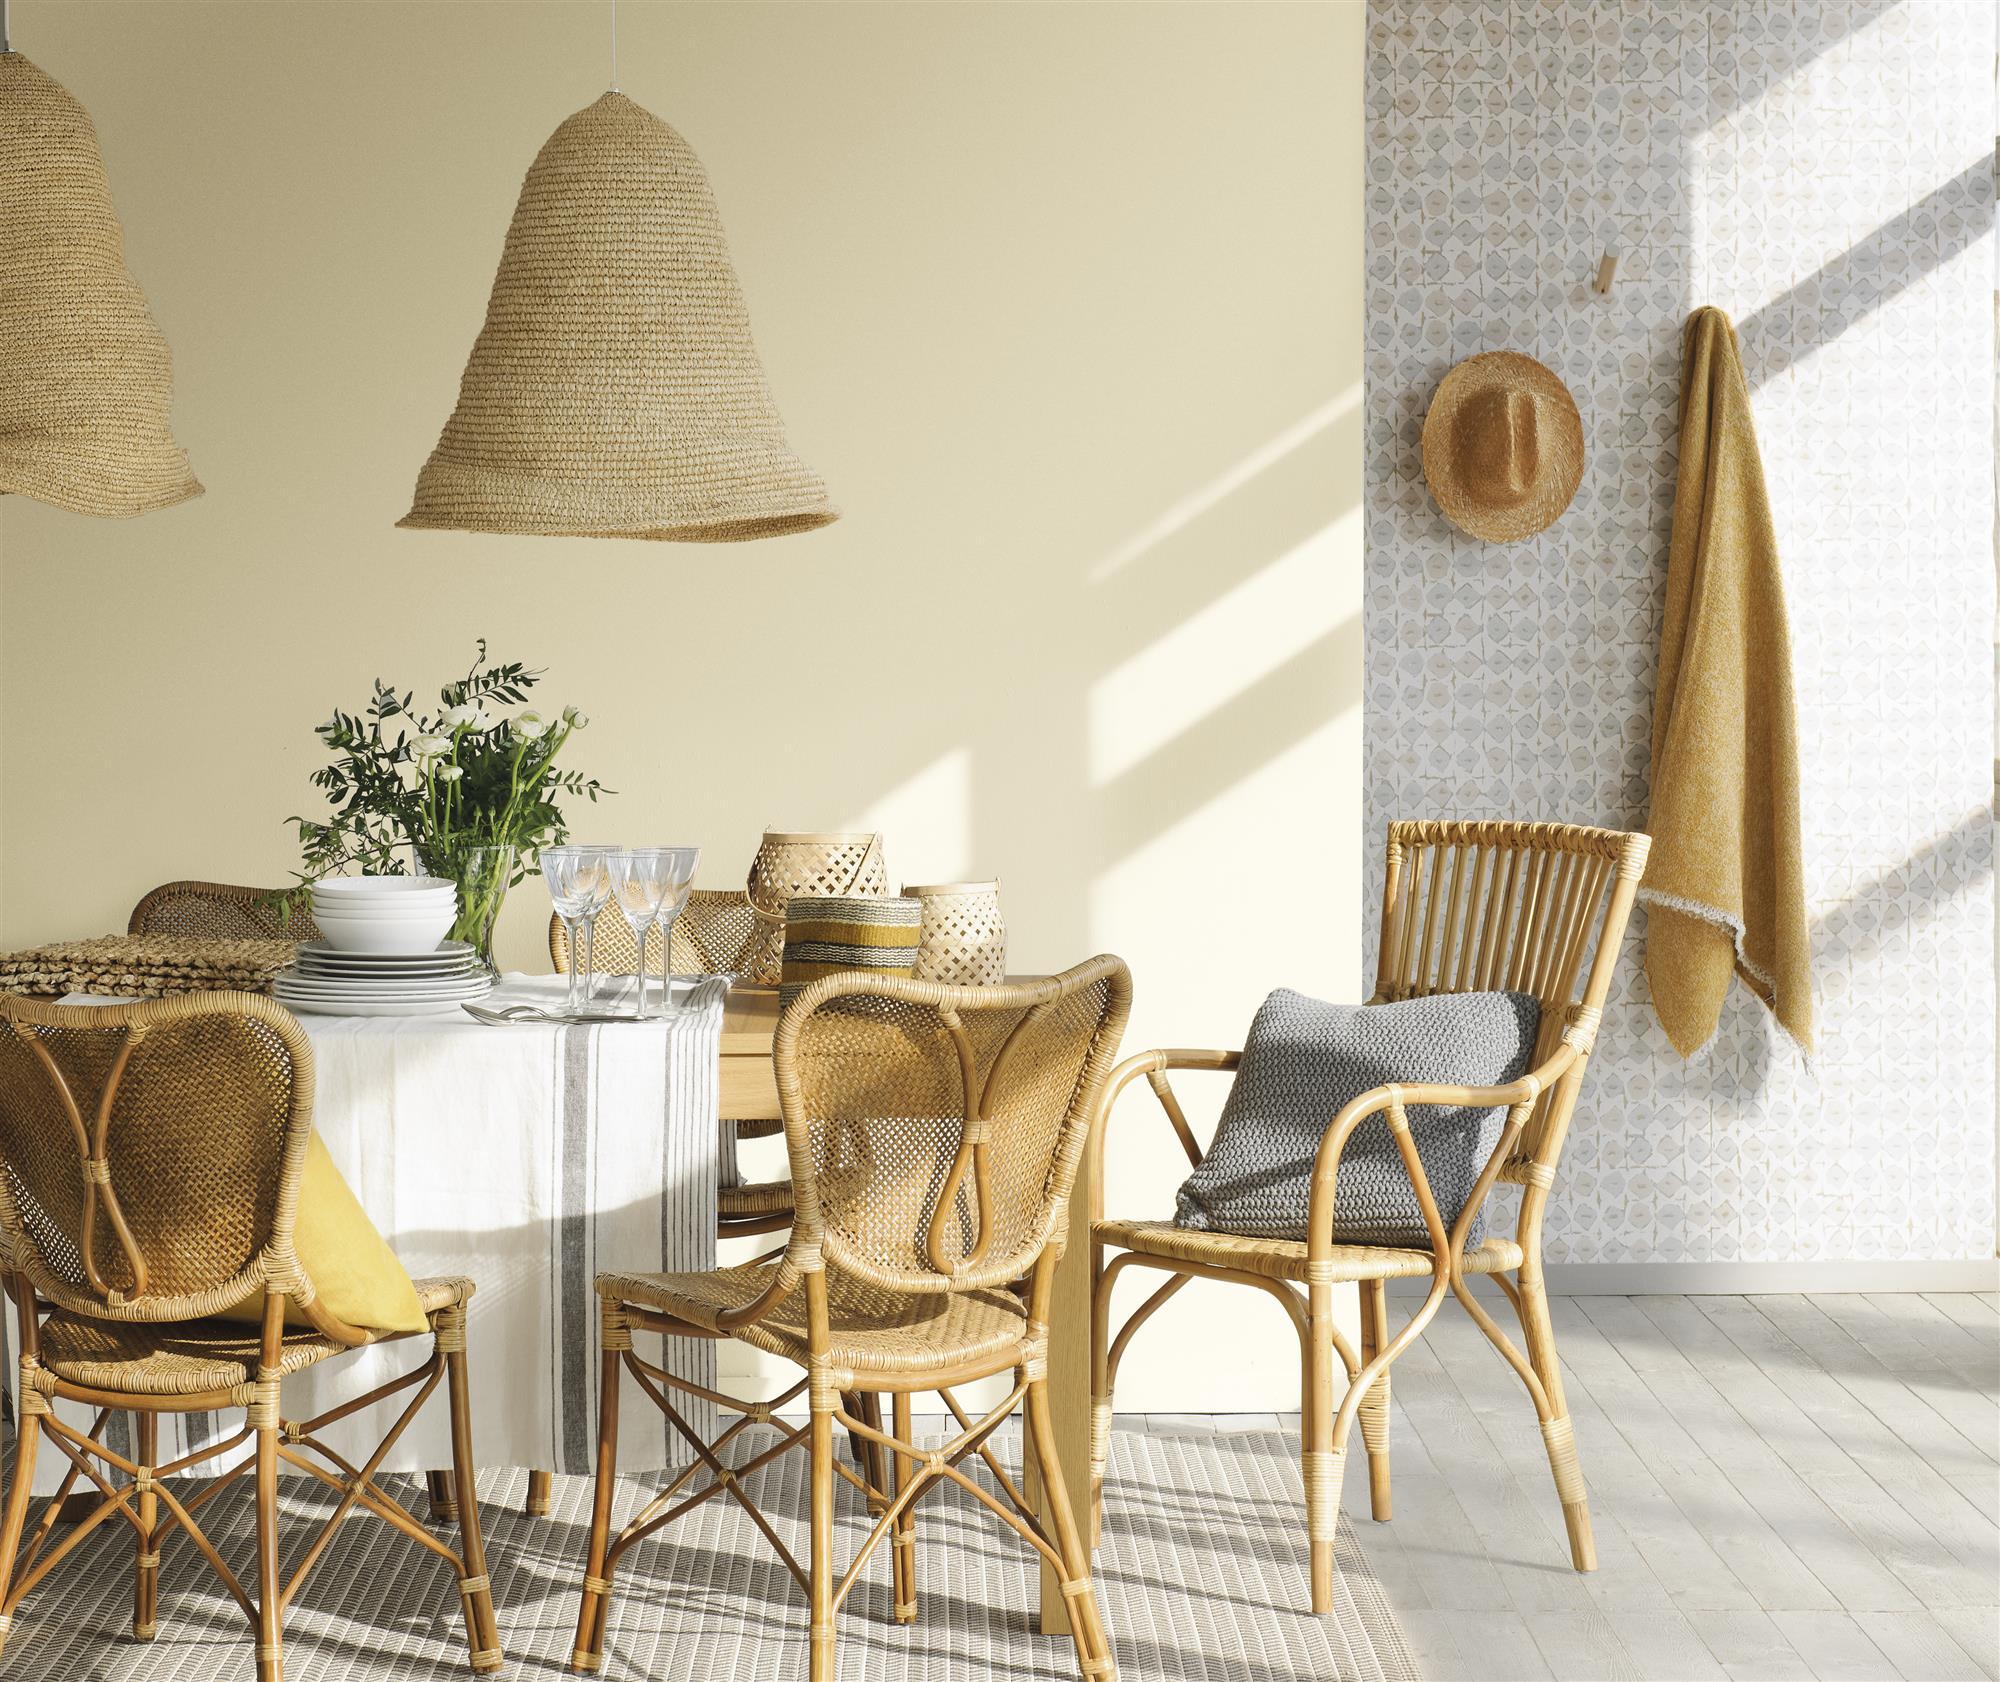 1599 fotos de sillas - Sillas de fibra natural ...